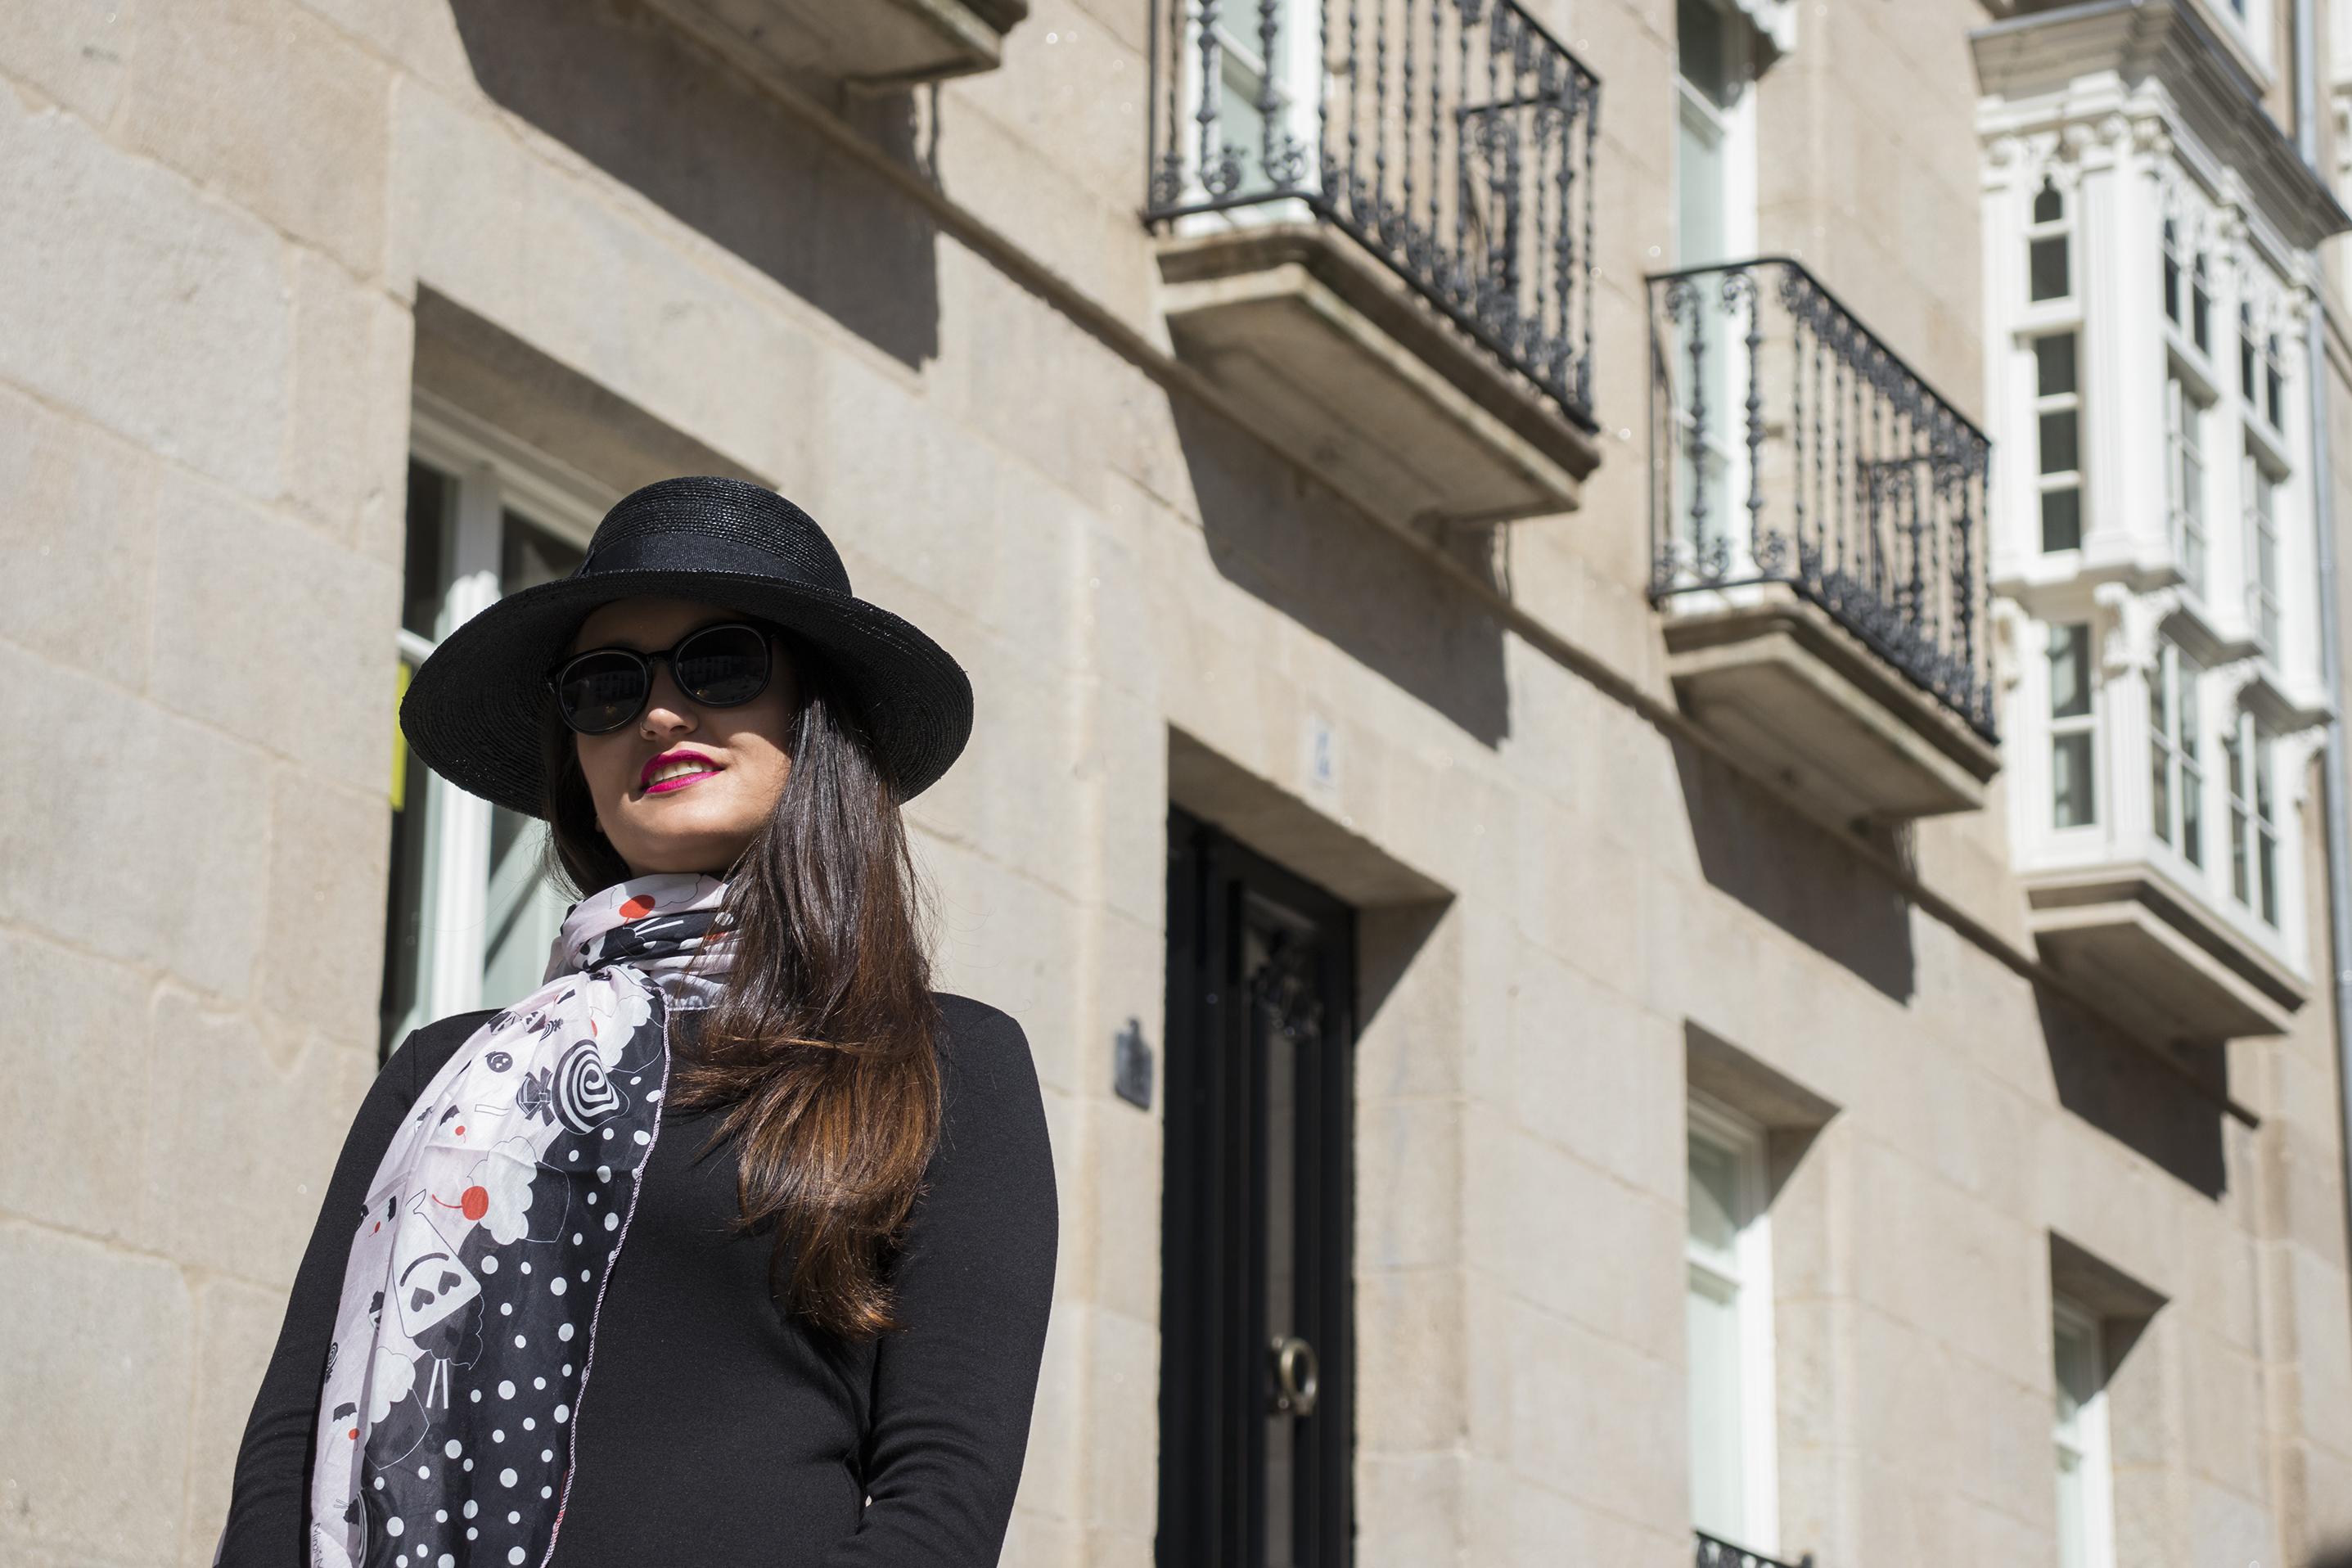 Sombreros La lucha, pamela negra